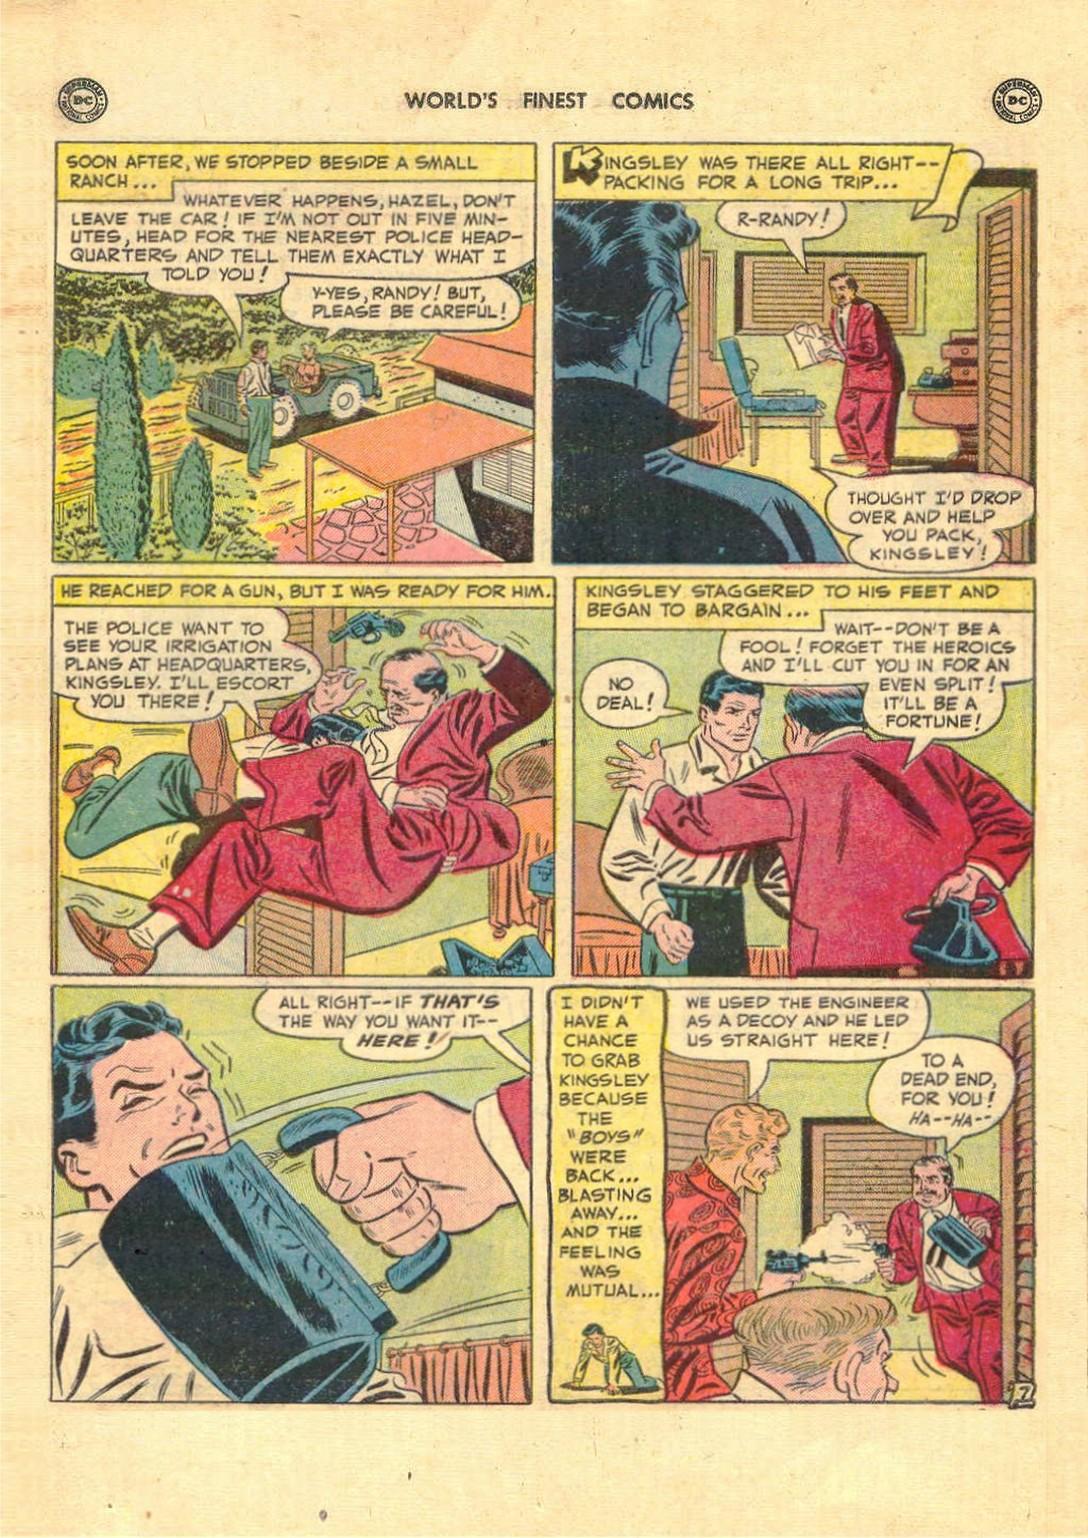 Read online World's Finest Comics comic -  Issue #52 - 33